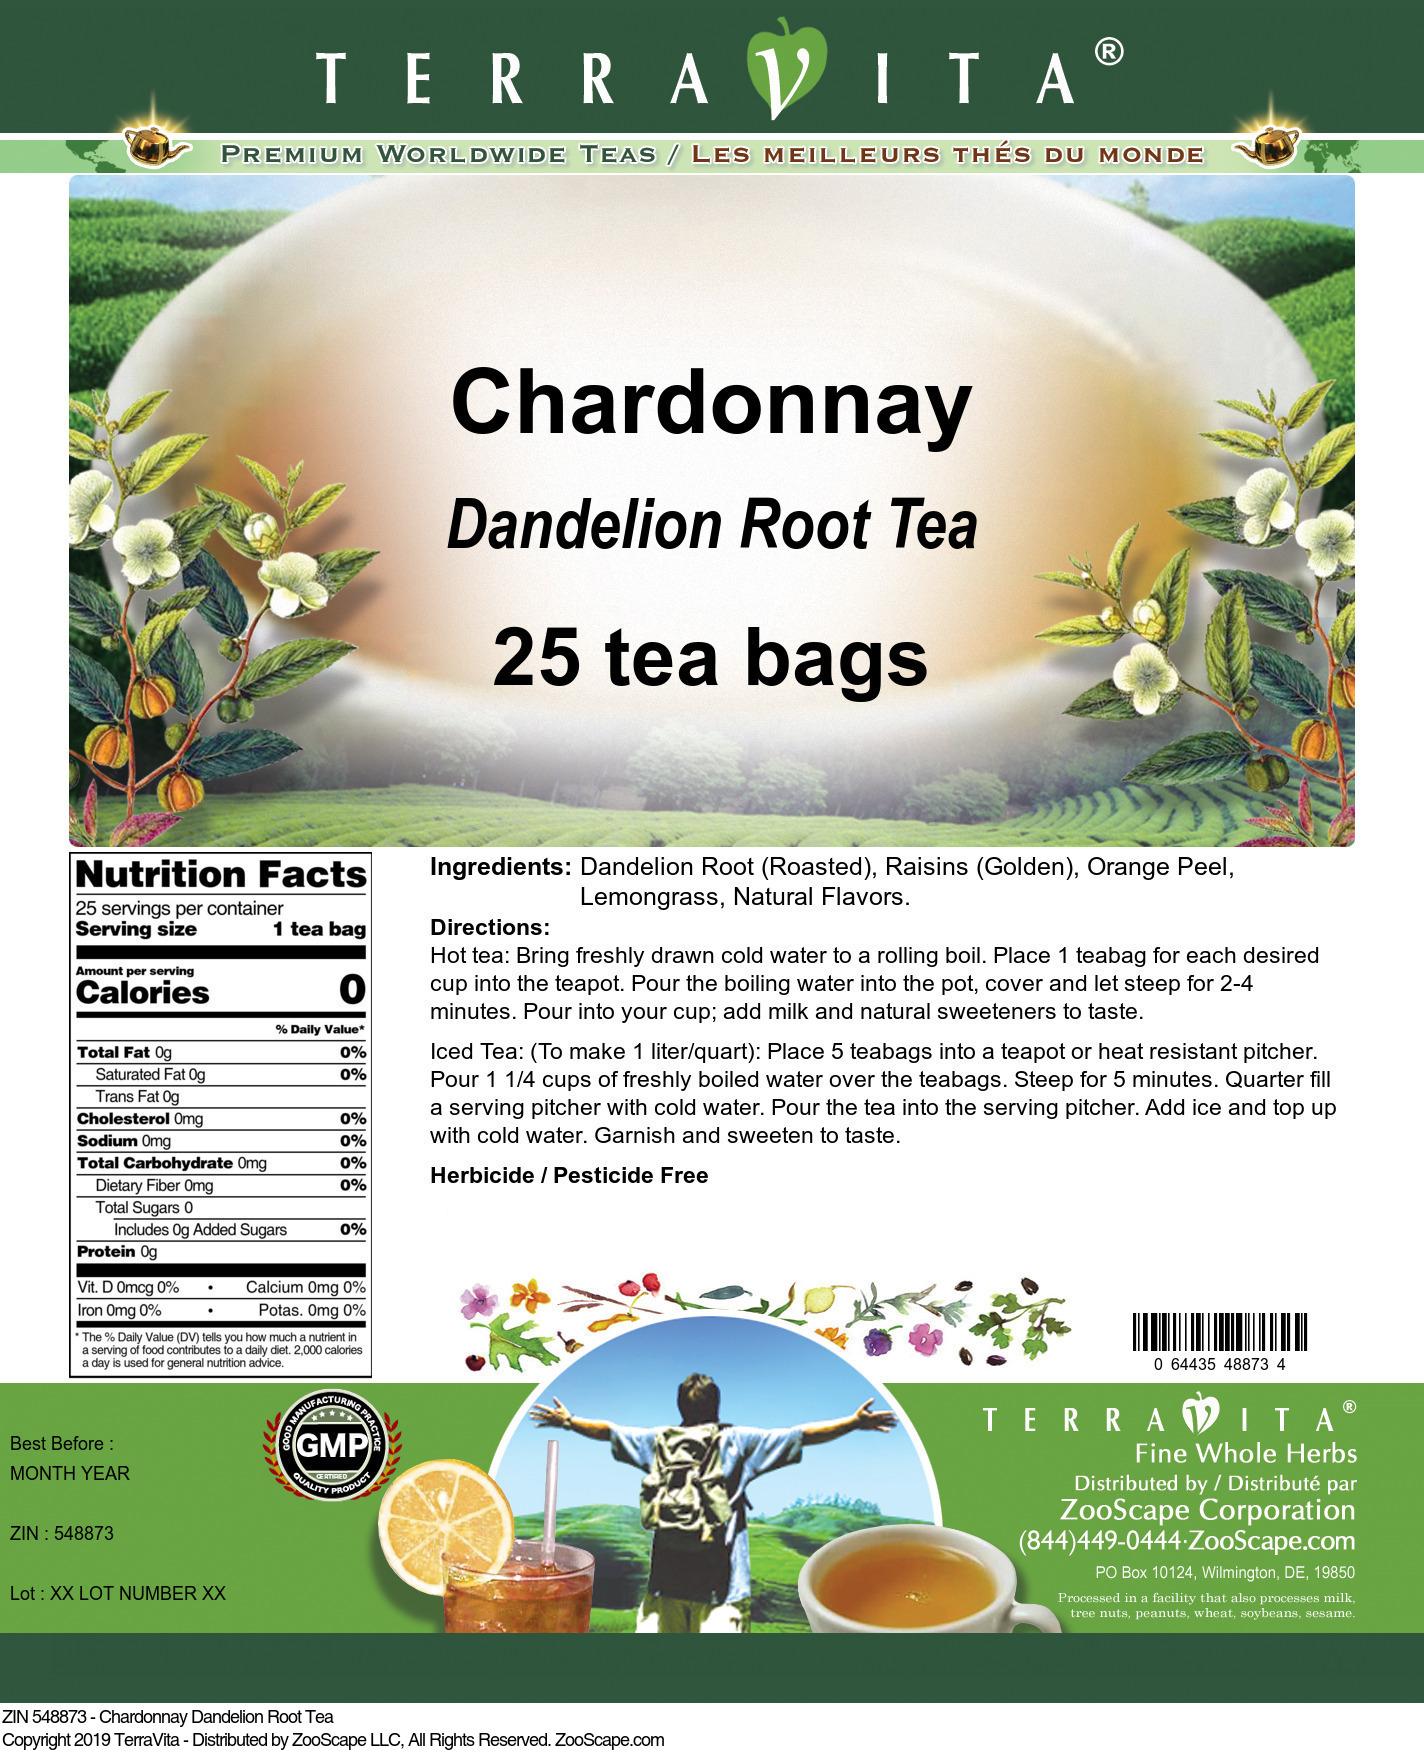 Chardonnay Dandelion Root Tea